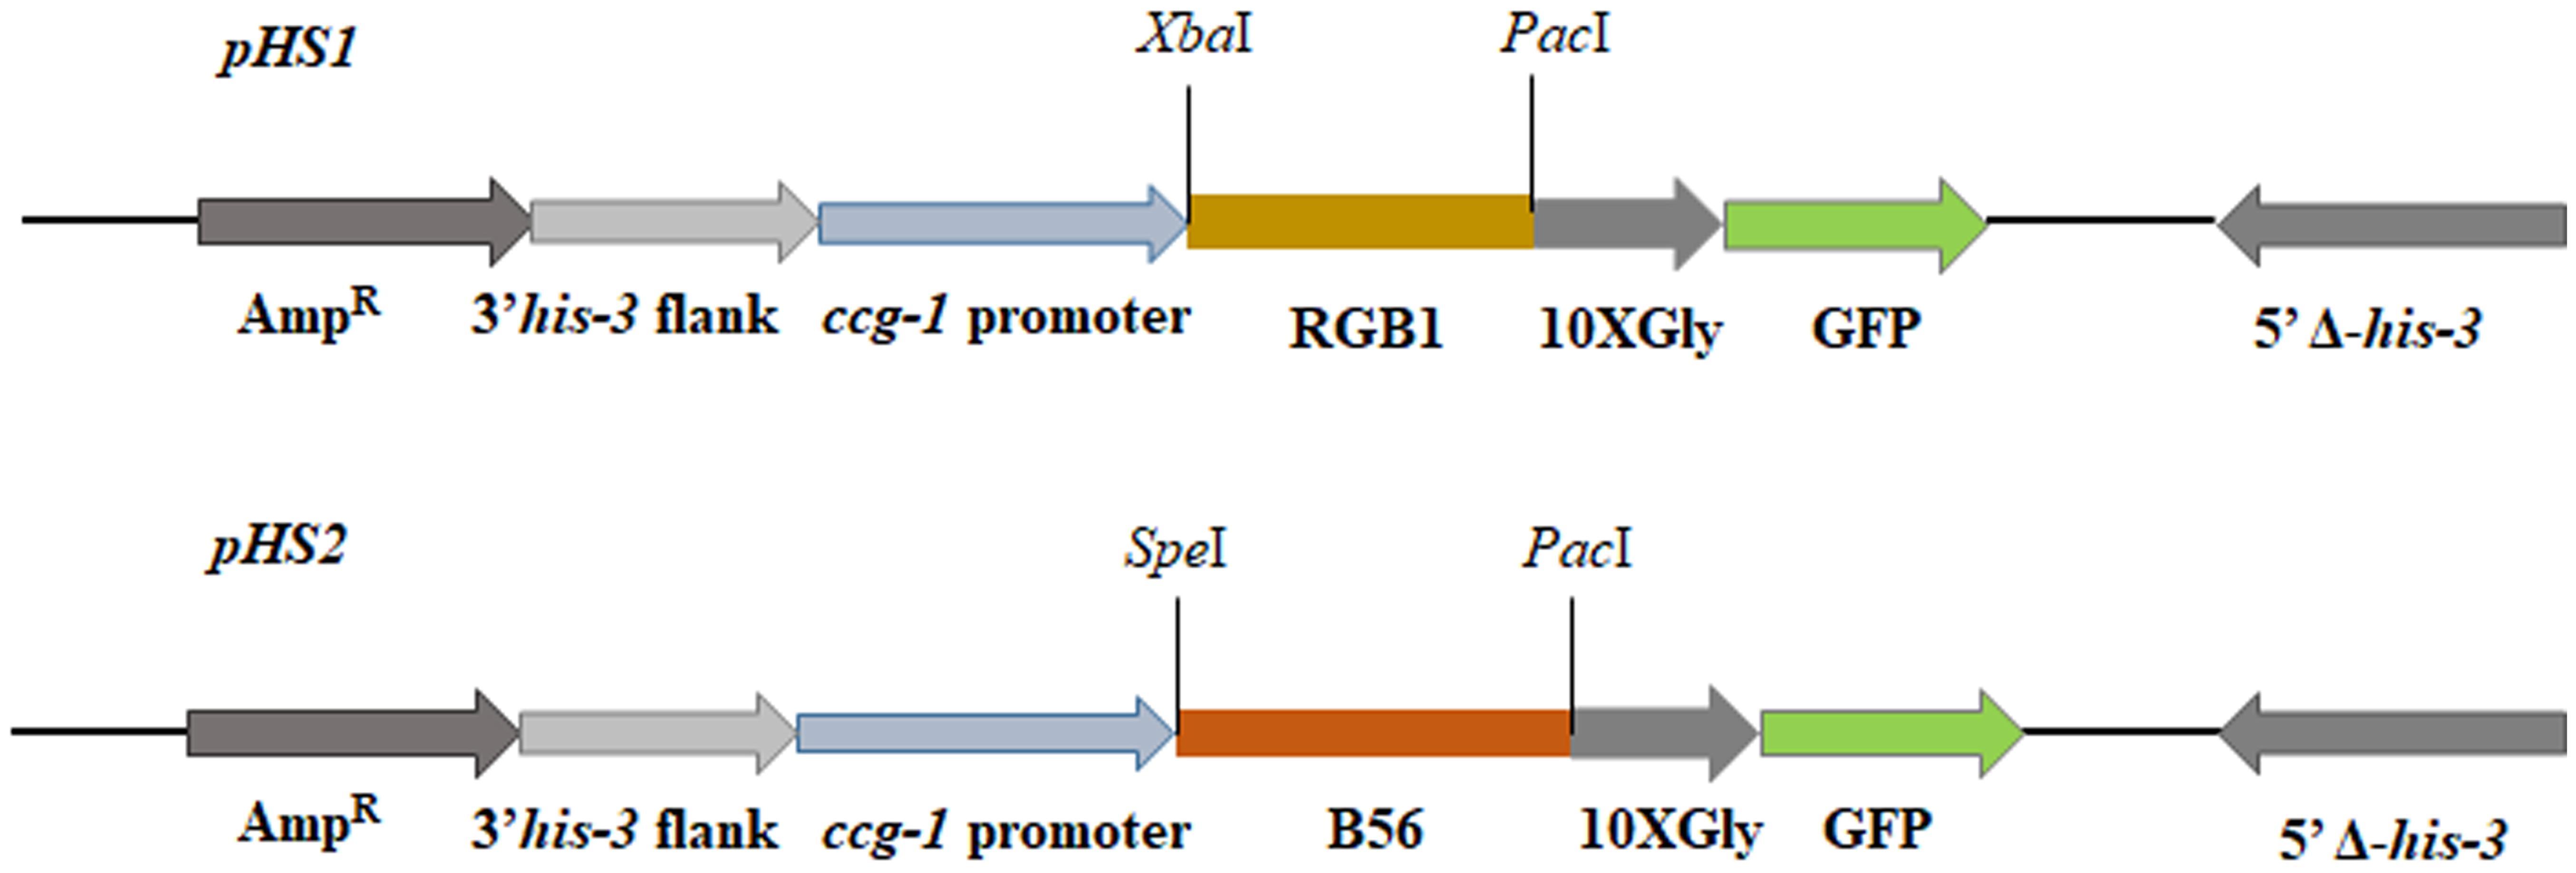 Honda Of Princeton >> Frontiers | The Neurospora crassa PP2A Regulatory Subunits ...